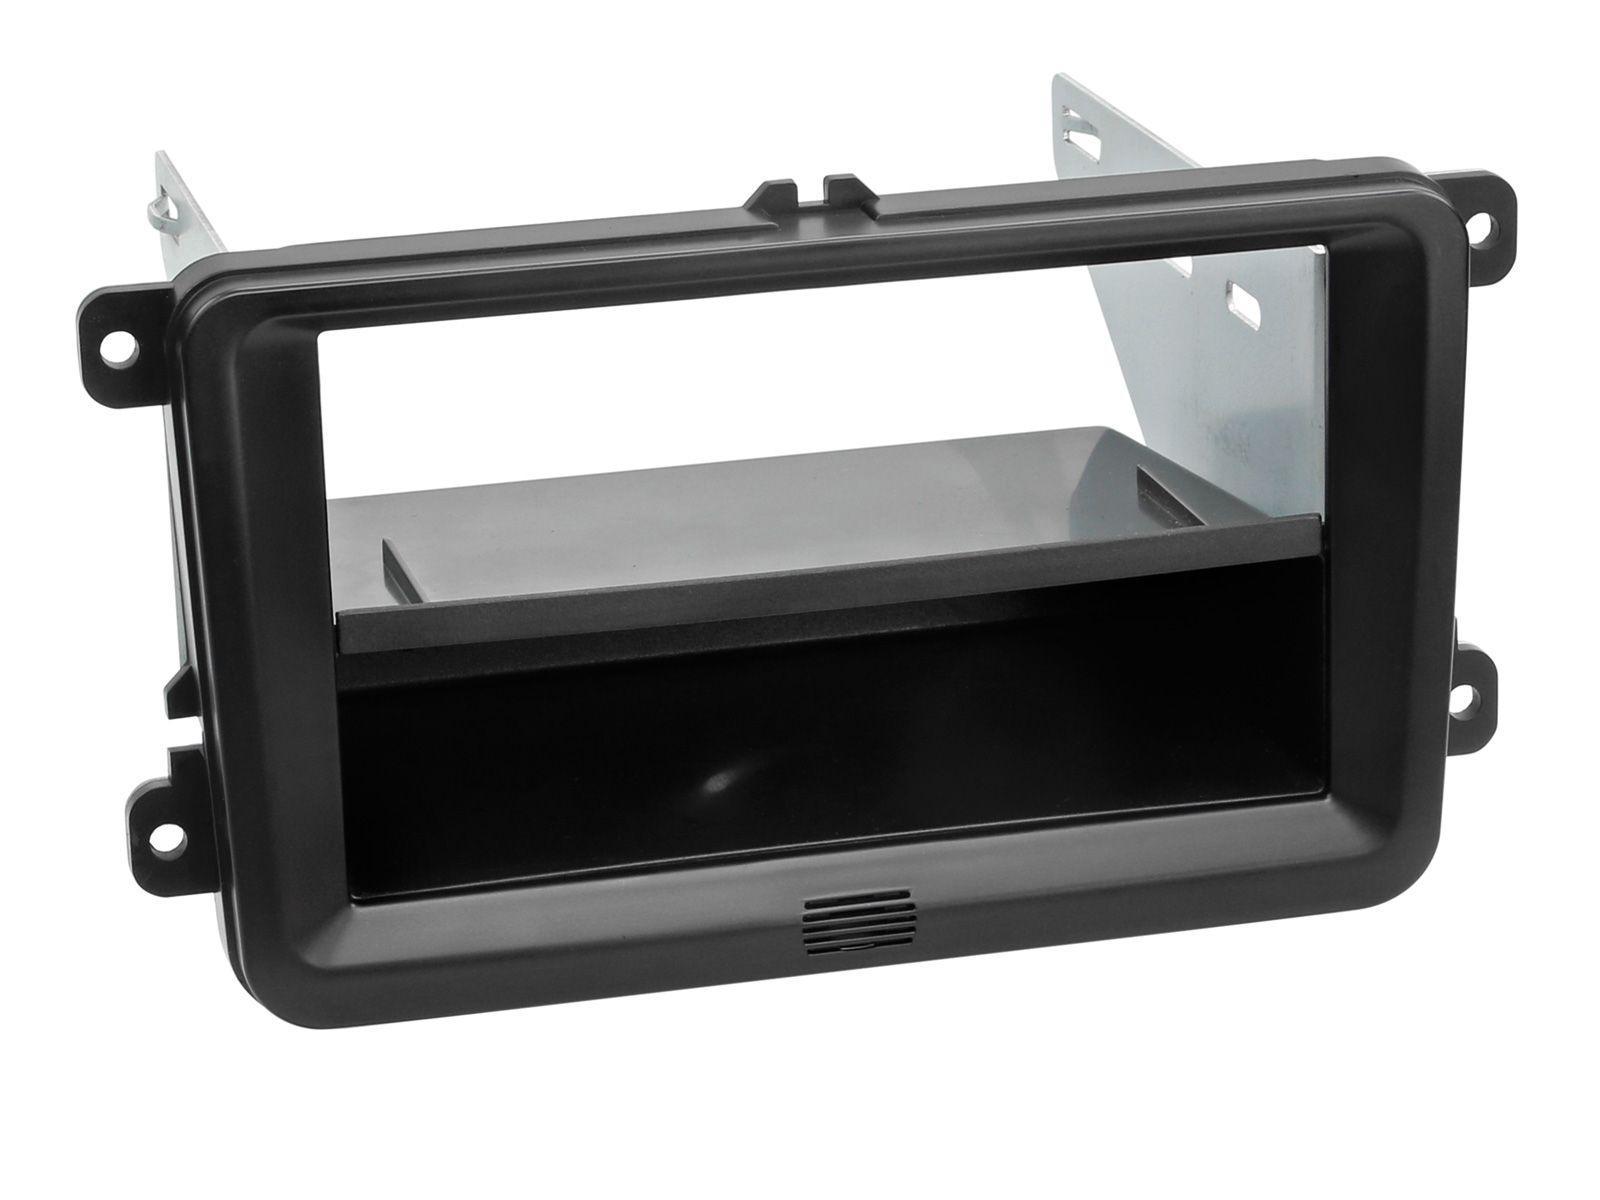 Alpine APF-F281320-30-1VW 2-DIN Installations-Kit für 1-DIN Headunit oder iLX-F903D/INE-F904D/DC in diversen VW's, Seat's, Skoda's